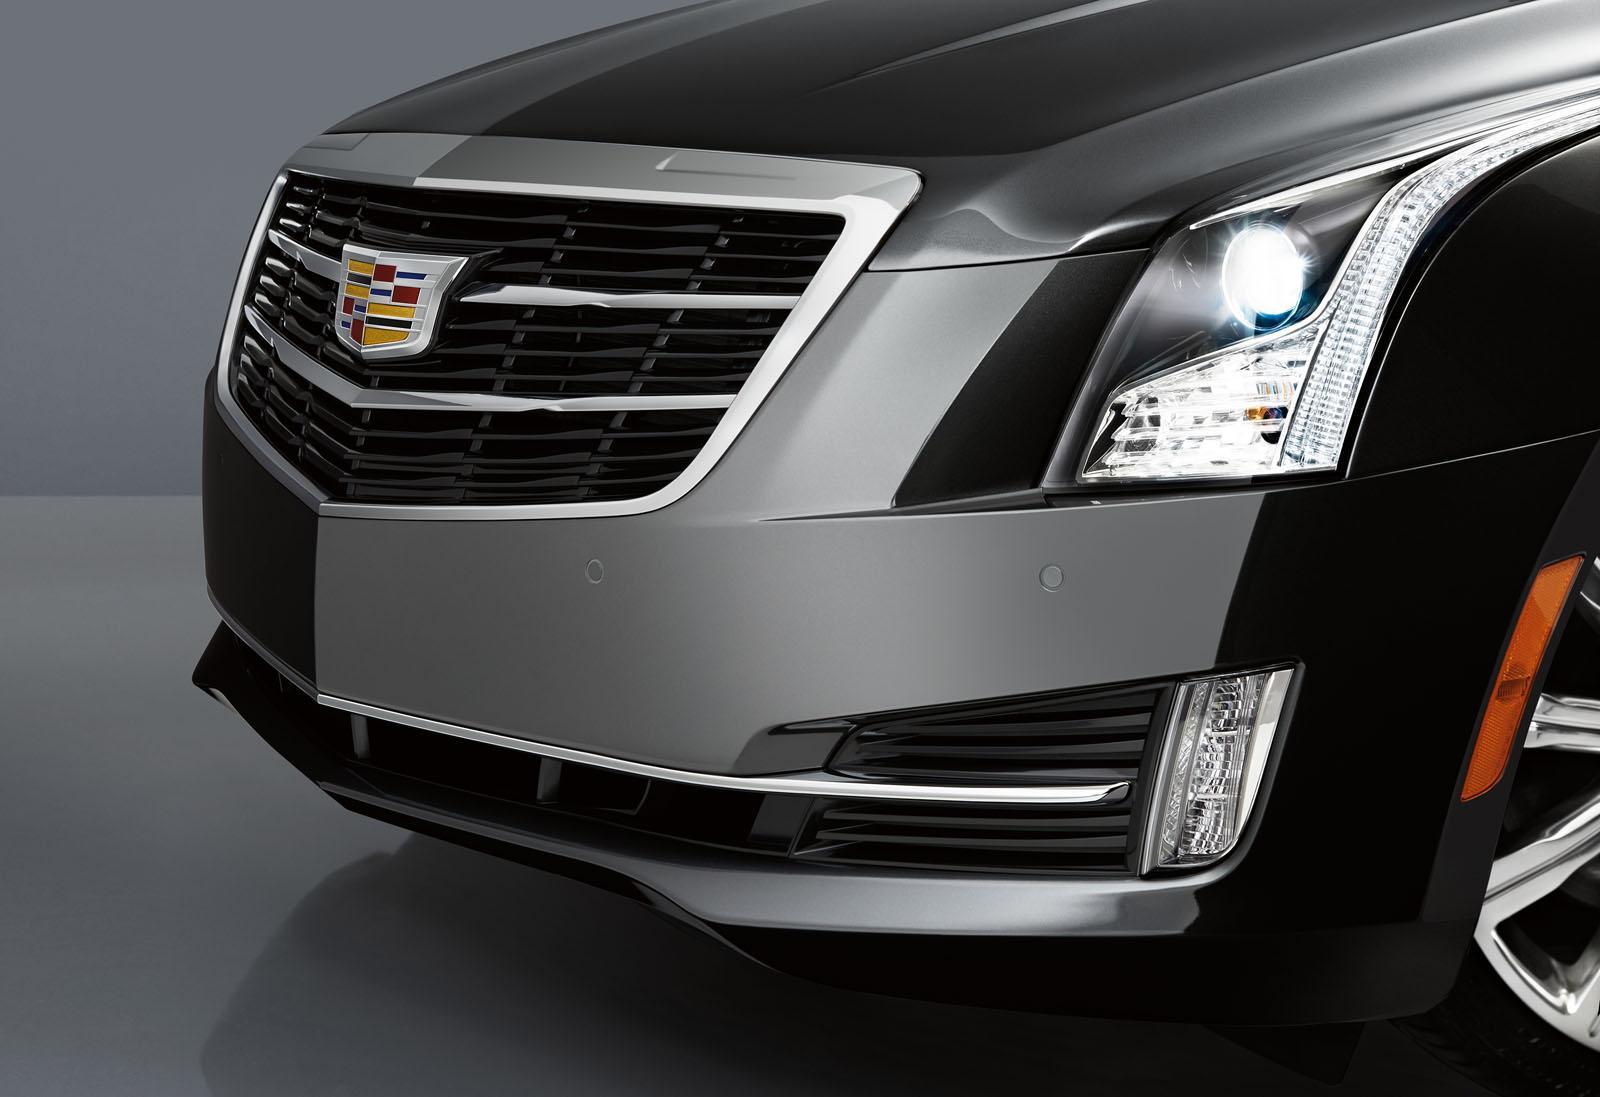 cadillac logo 2015. 2015 cadillac ats sedan logo